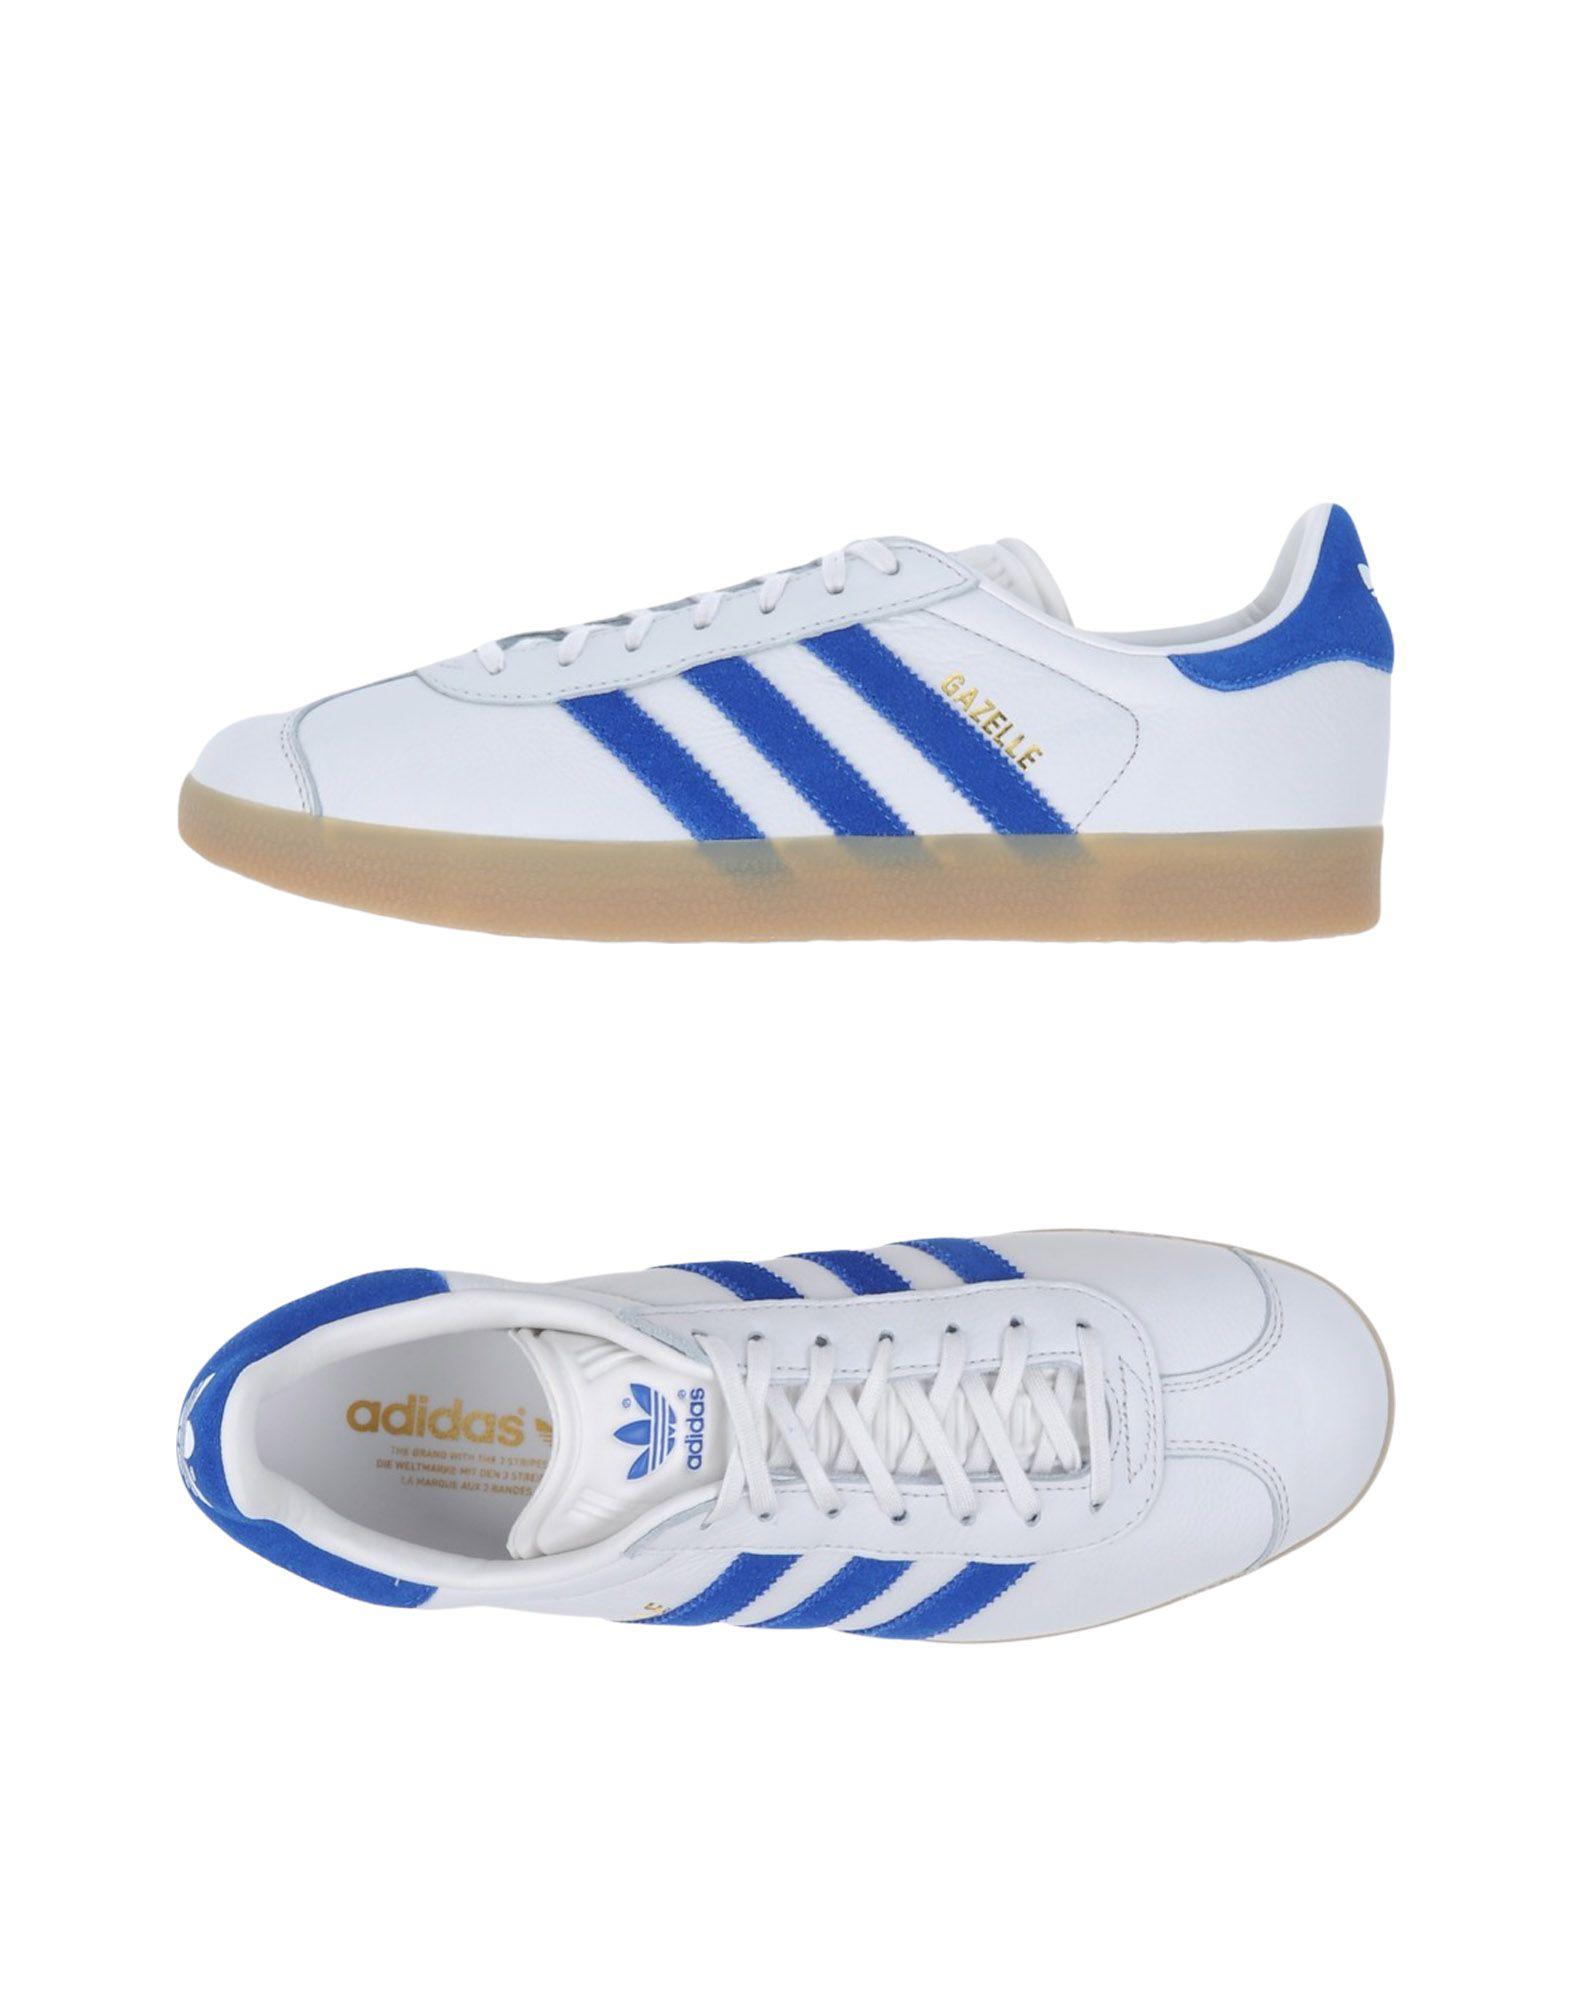 best service fbb37 3c28d Adidas Originals Παπουτσια Παπούτσια Τένις Χαμηλά